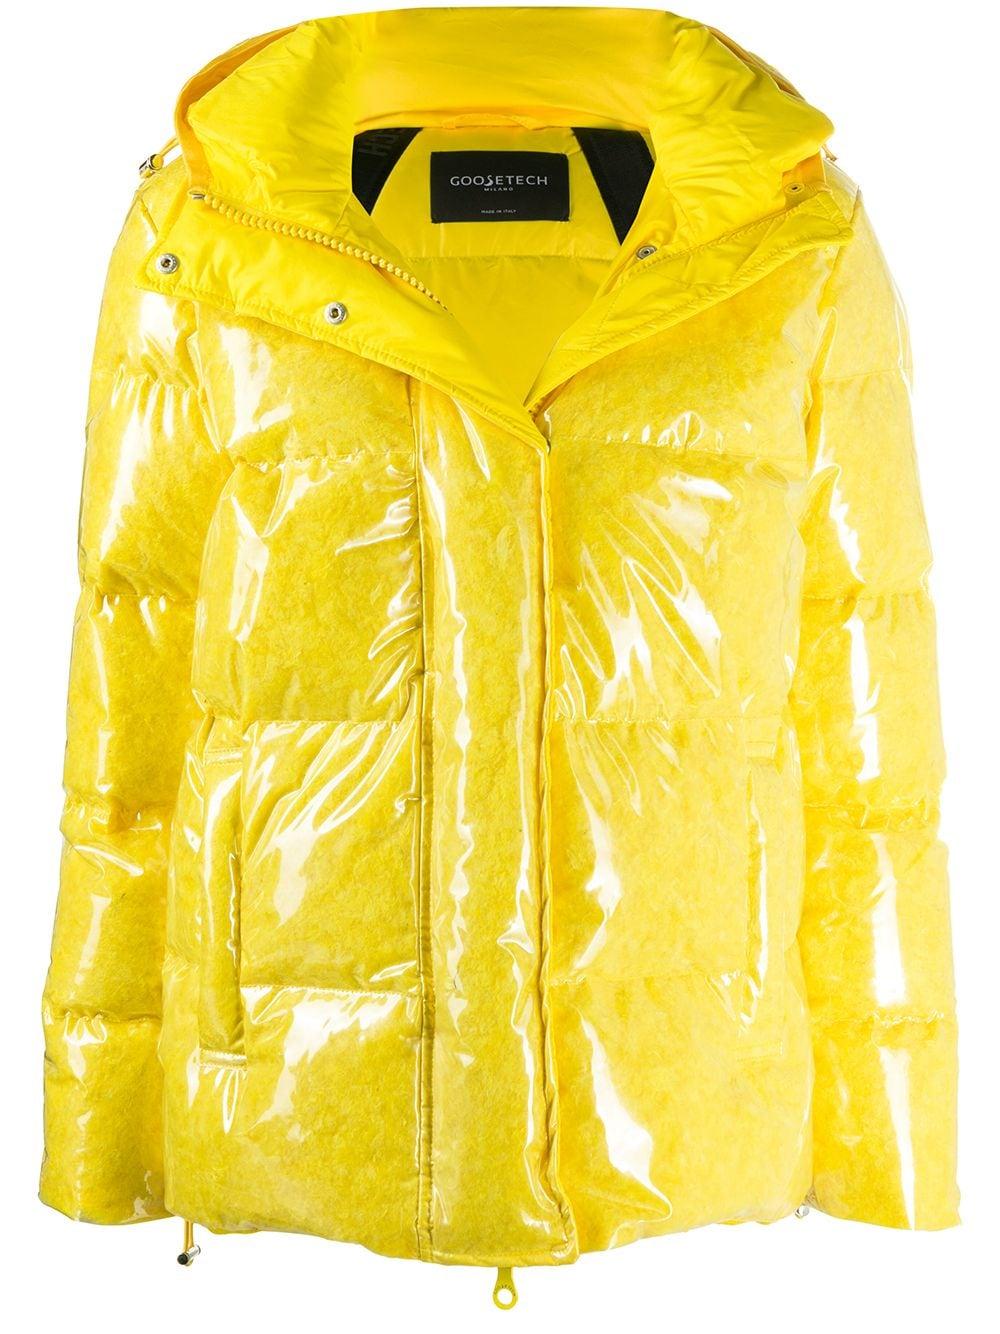 Goose Tech, Wet-look padded jacket 2570лв, 2056лв